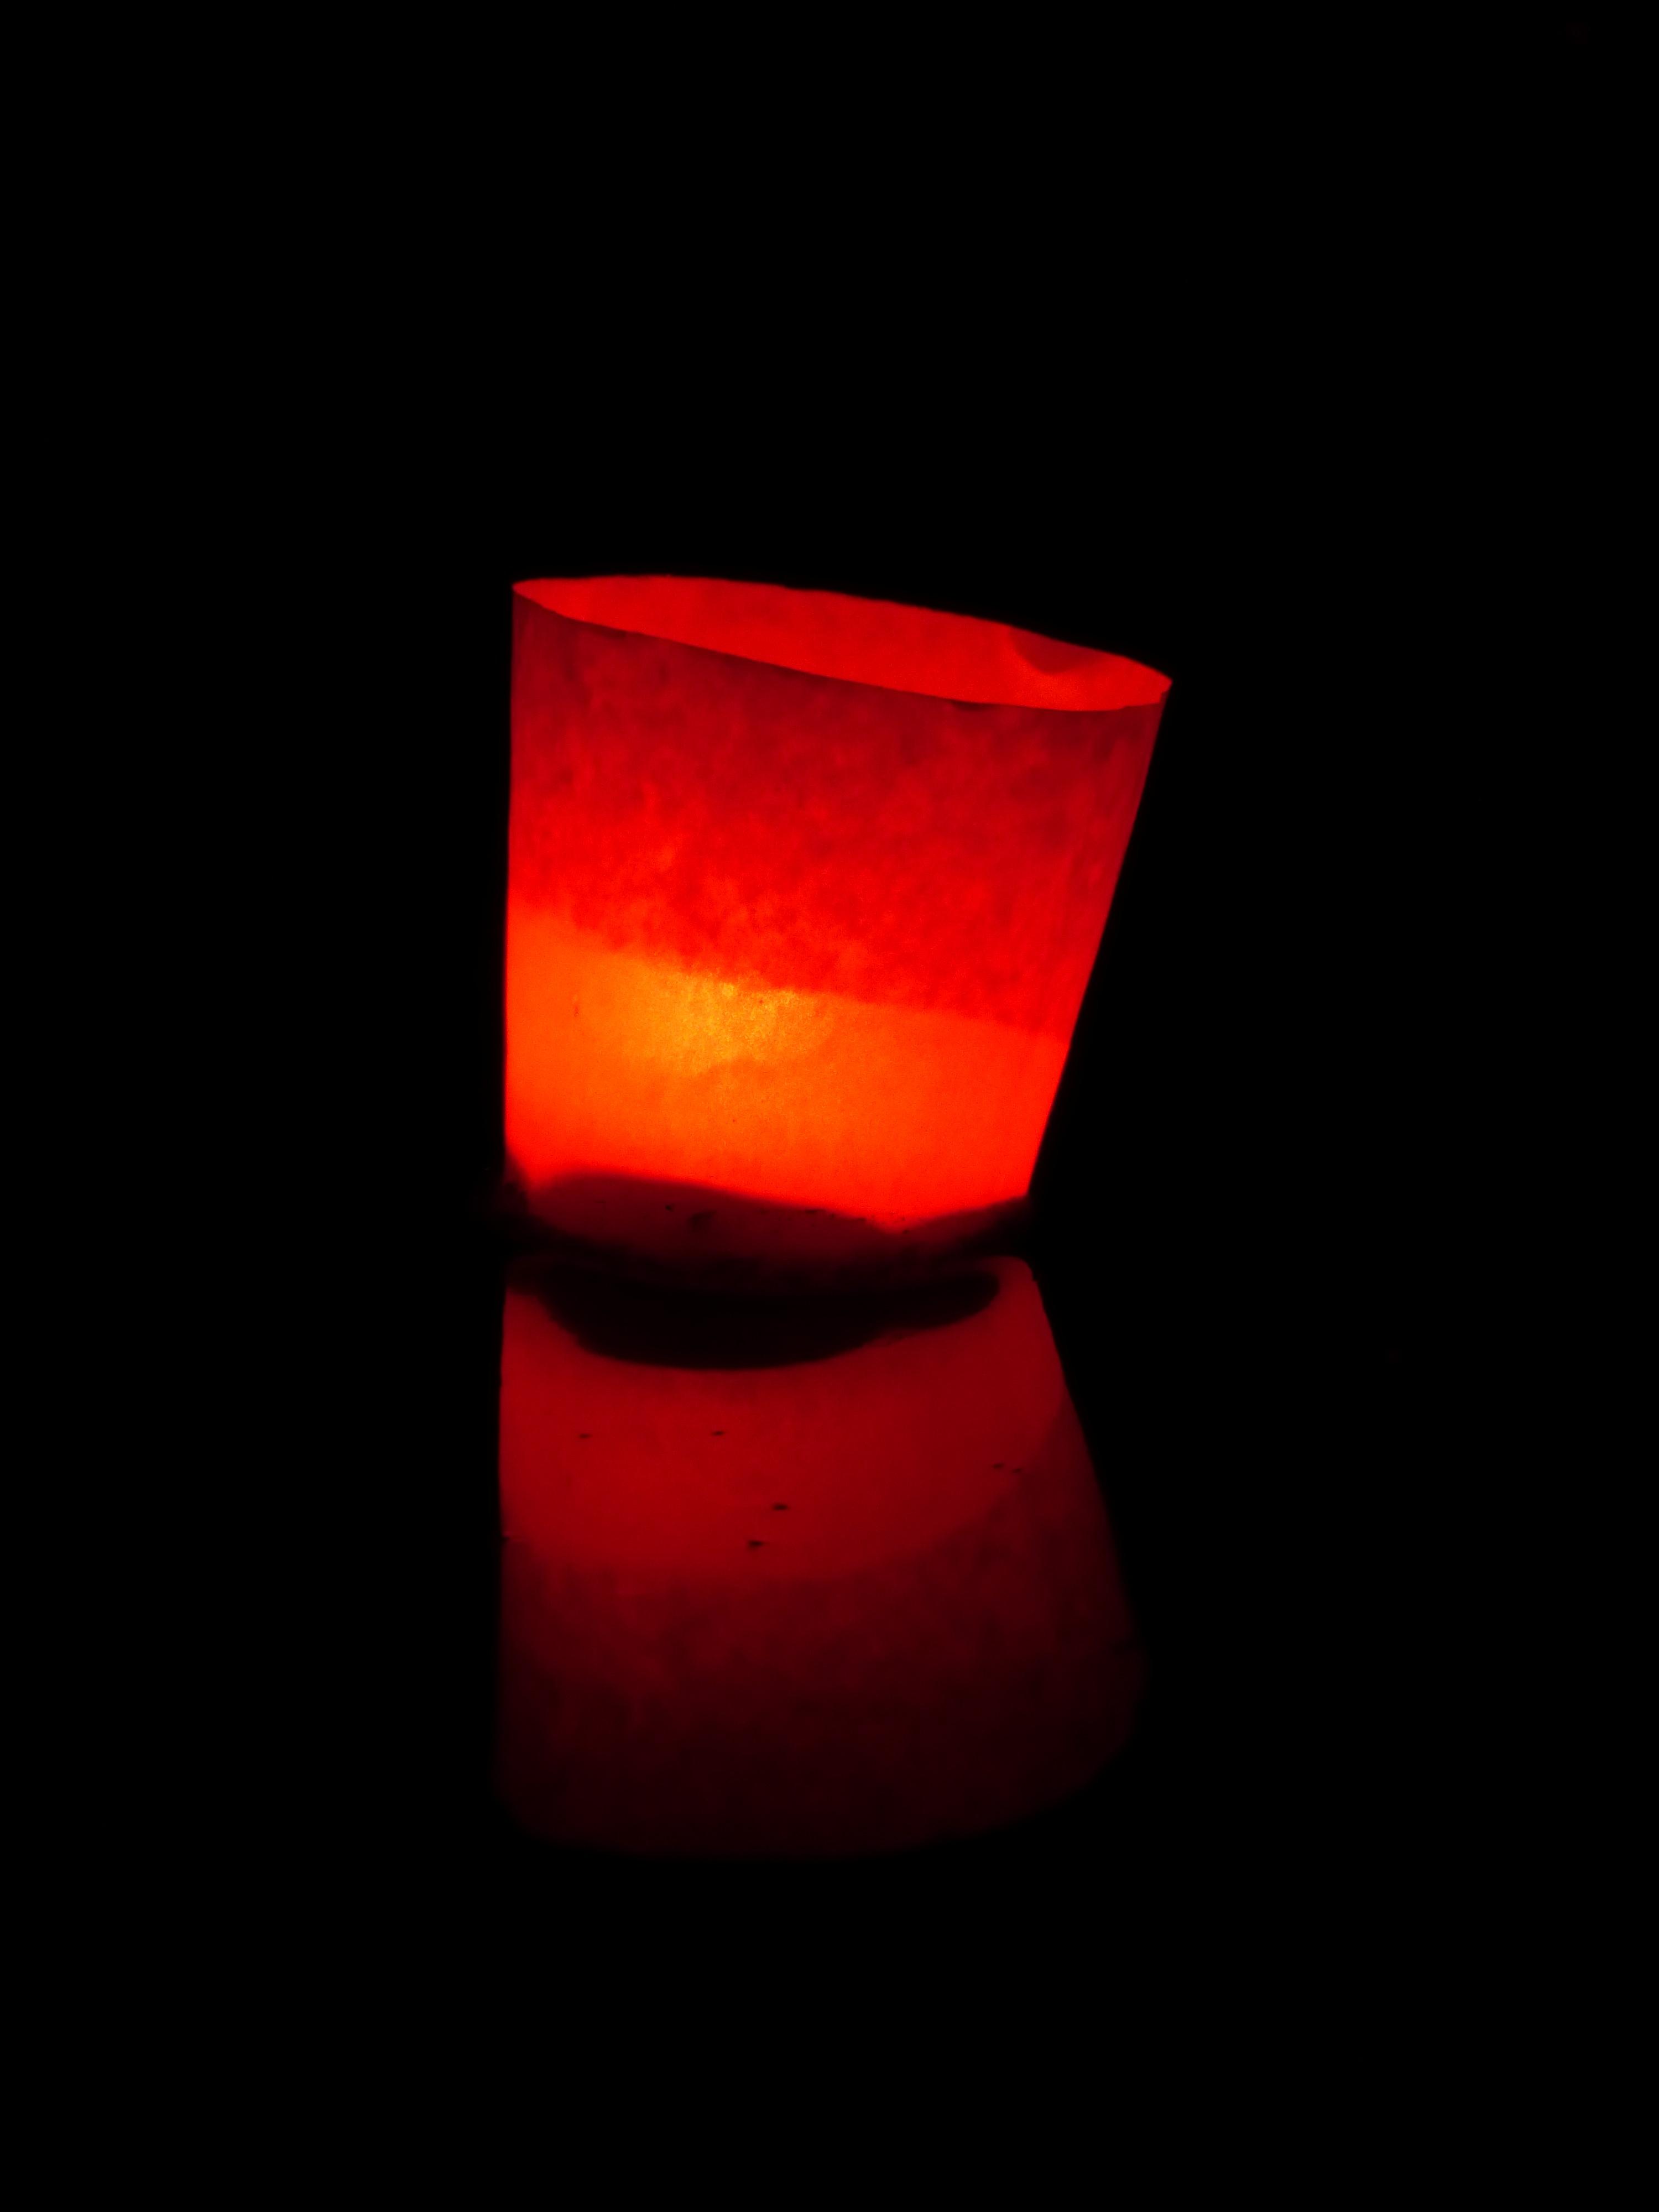 fotos gratis agua ligero noche ptalo atmsfera ro nadar amor rojo color llama romance oscuridad iluminacin calor larga exposicin